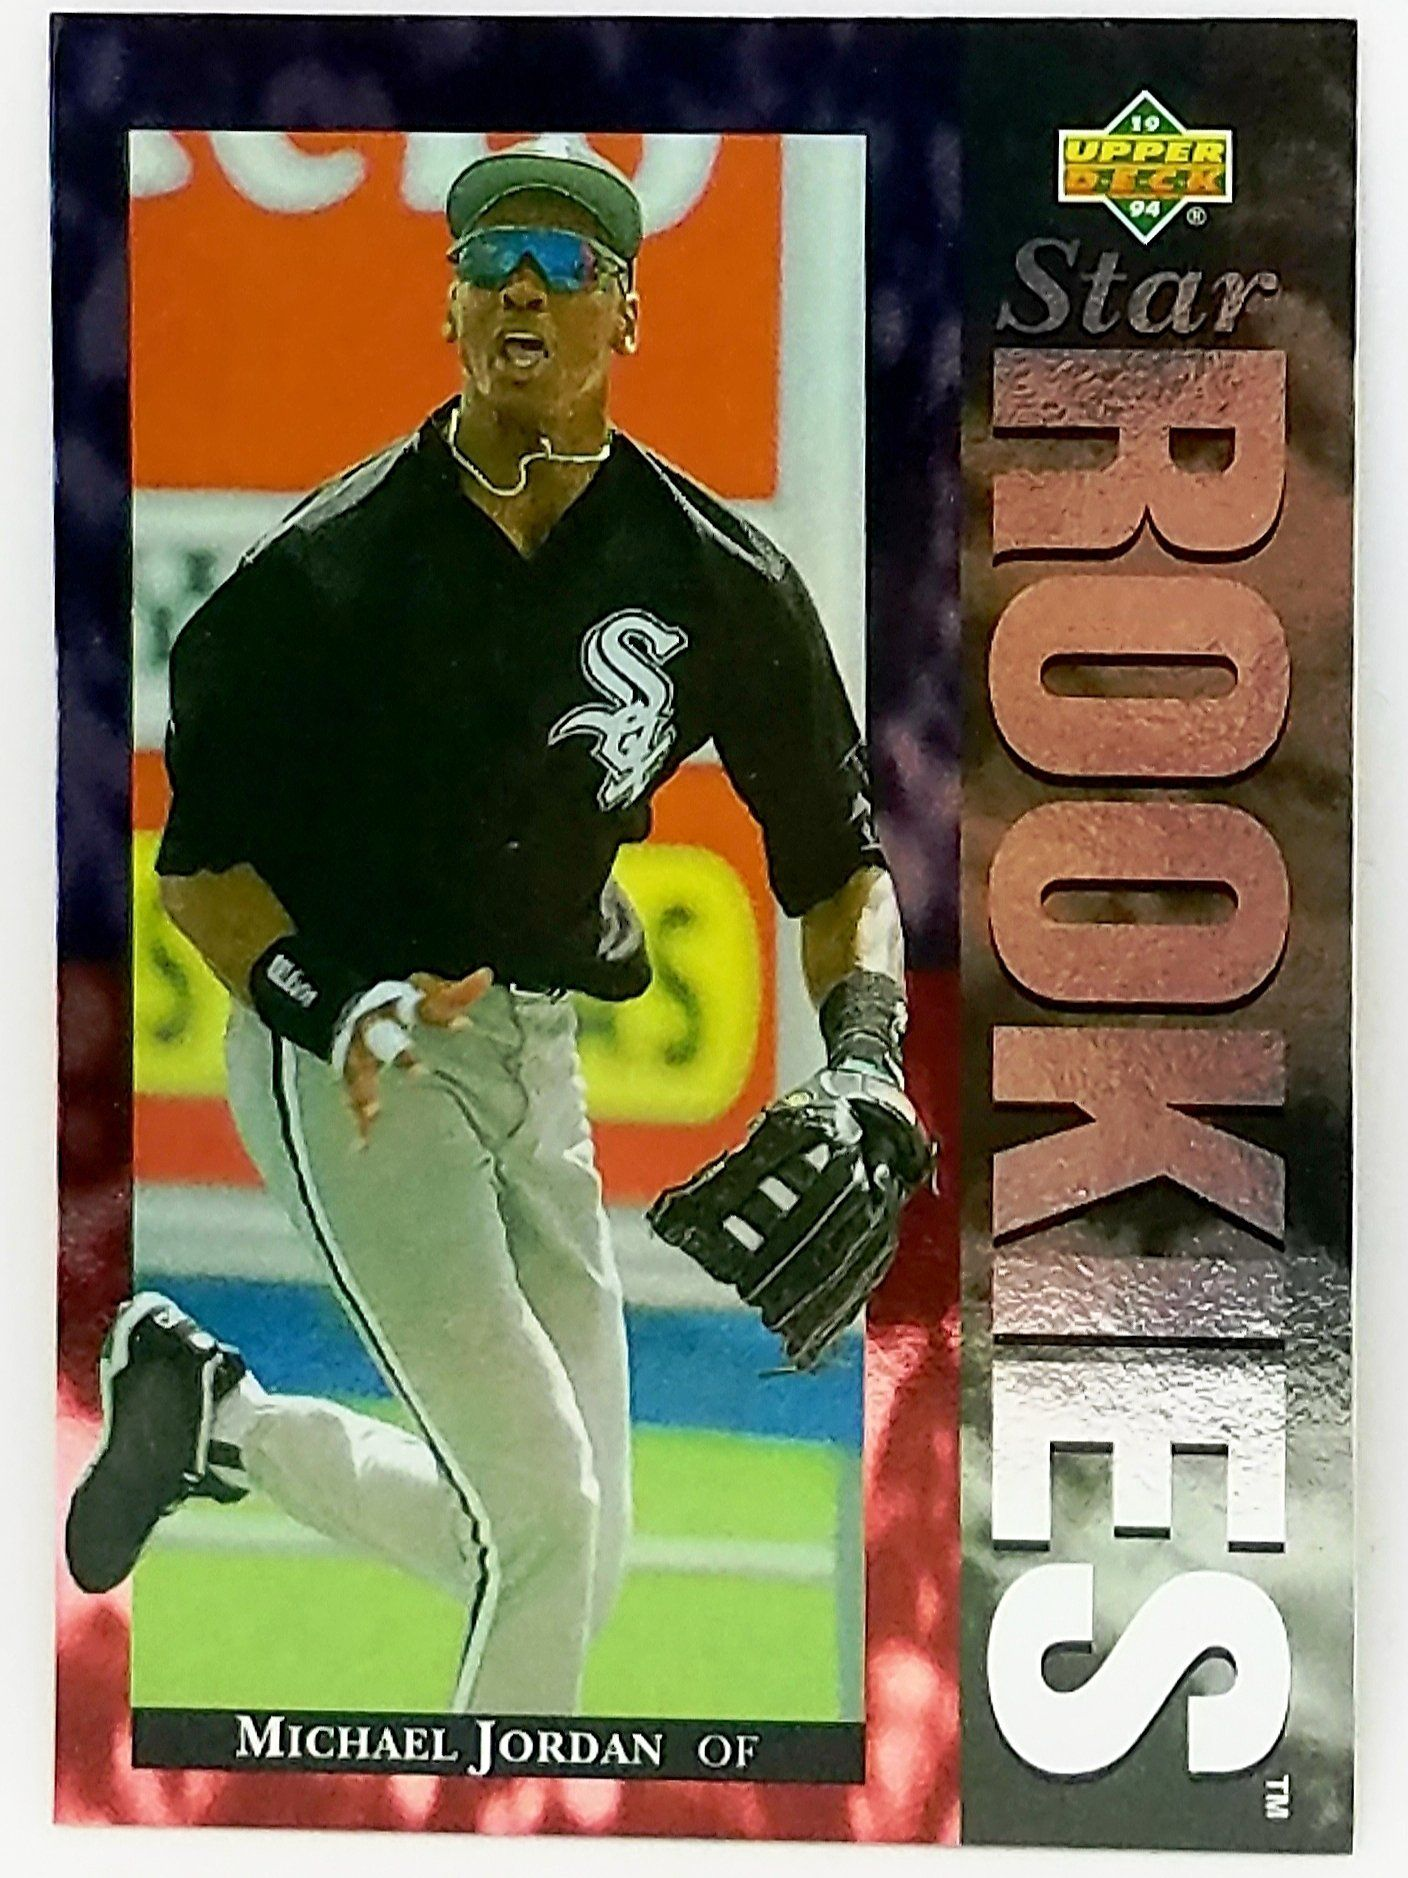 1994 Upper Deck 19 Michael Jordan Rookie Card Chicago White Sox Mlb